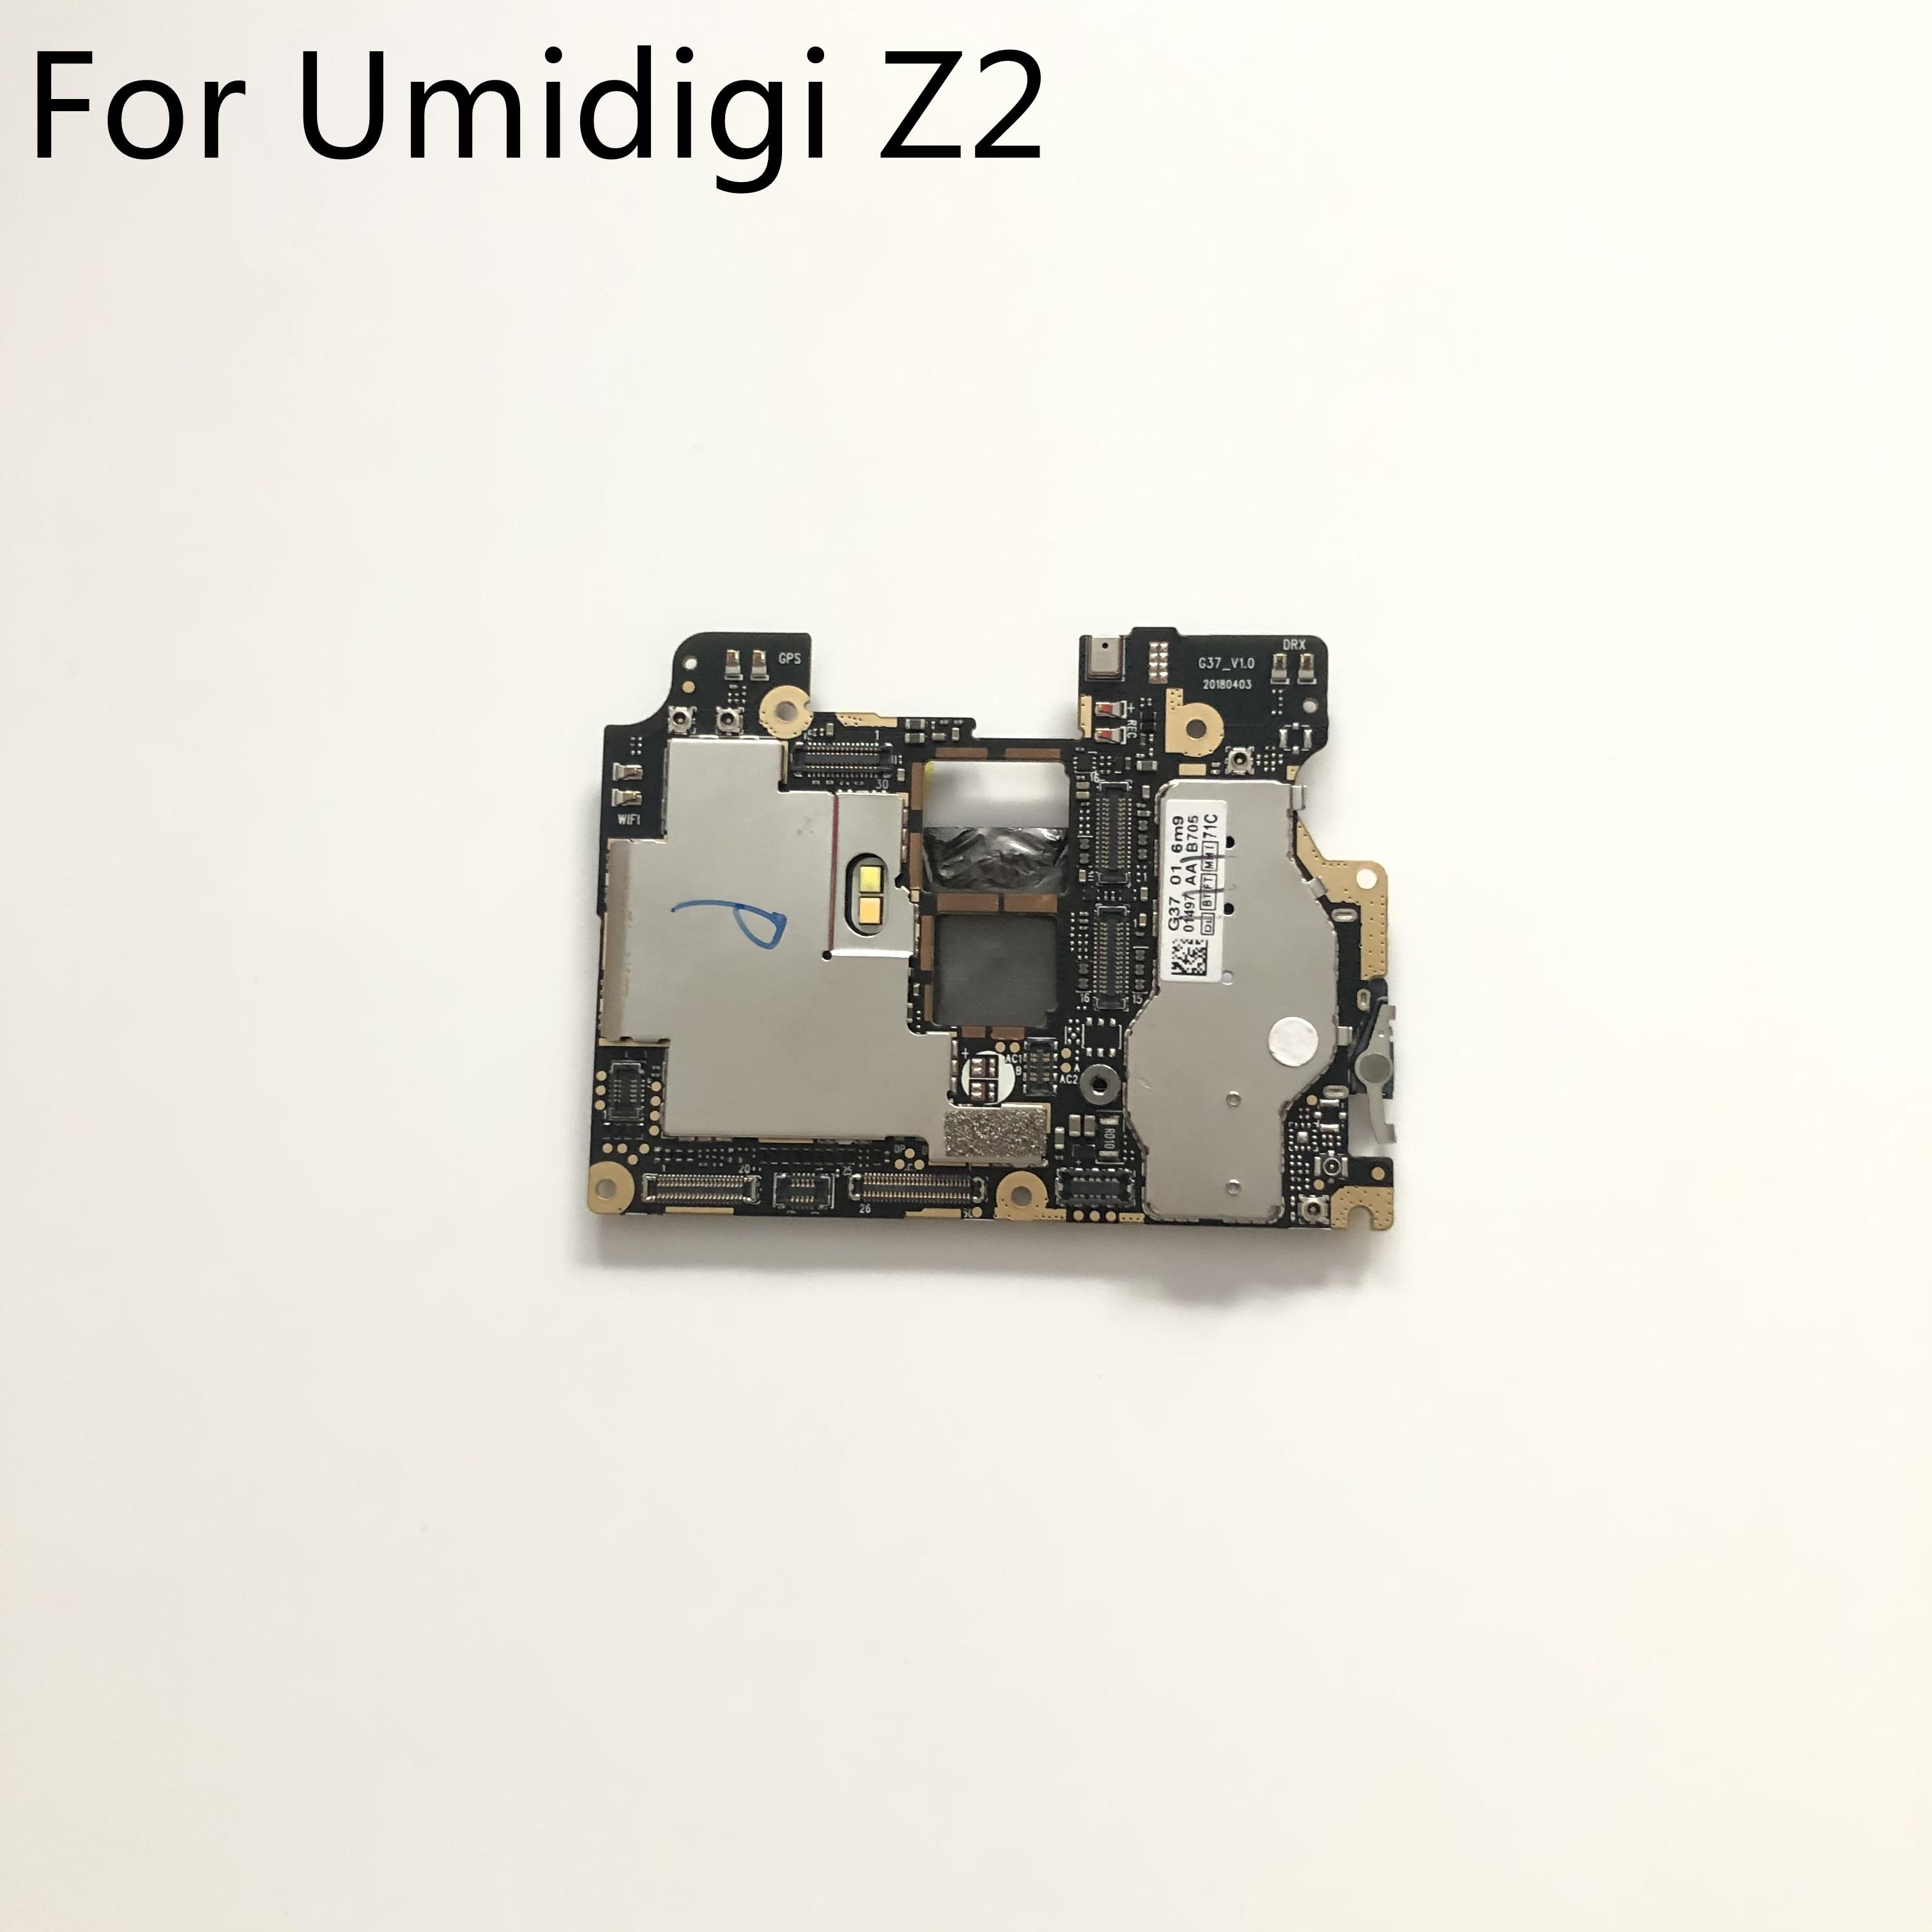 "Umidigi z2 usado mainboard 6g ram + 64g rom placa-mãe para umidigi z2 mtk6763 octa núcleo 6.2 ""2246x1080 frete grátis"